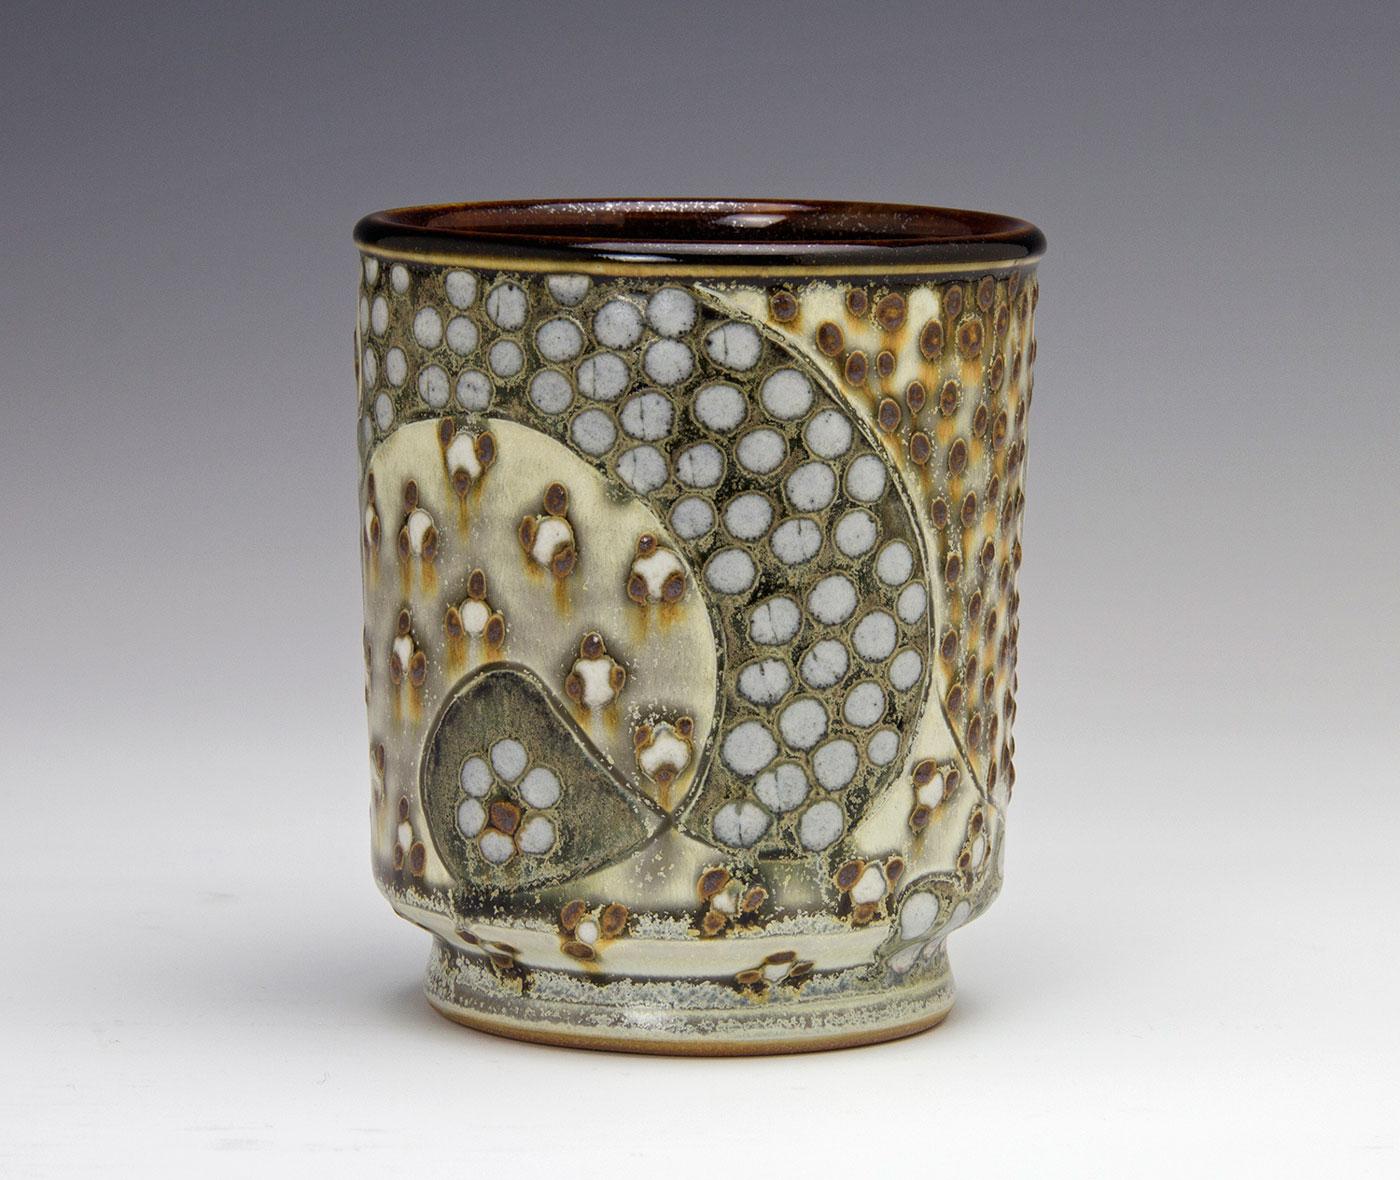 Pattern-Medley-studio-pottery-cup-Samantha-Henneke-Bulldog-Pottery-North-Carolina.jpg